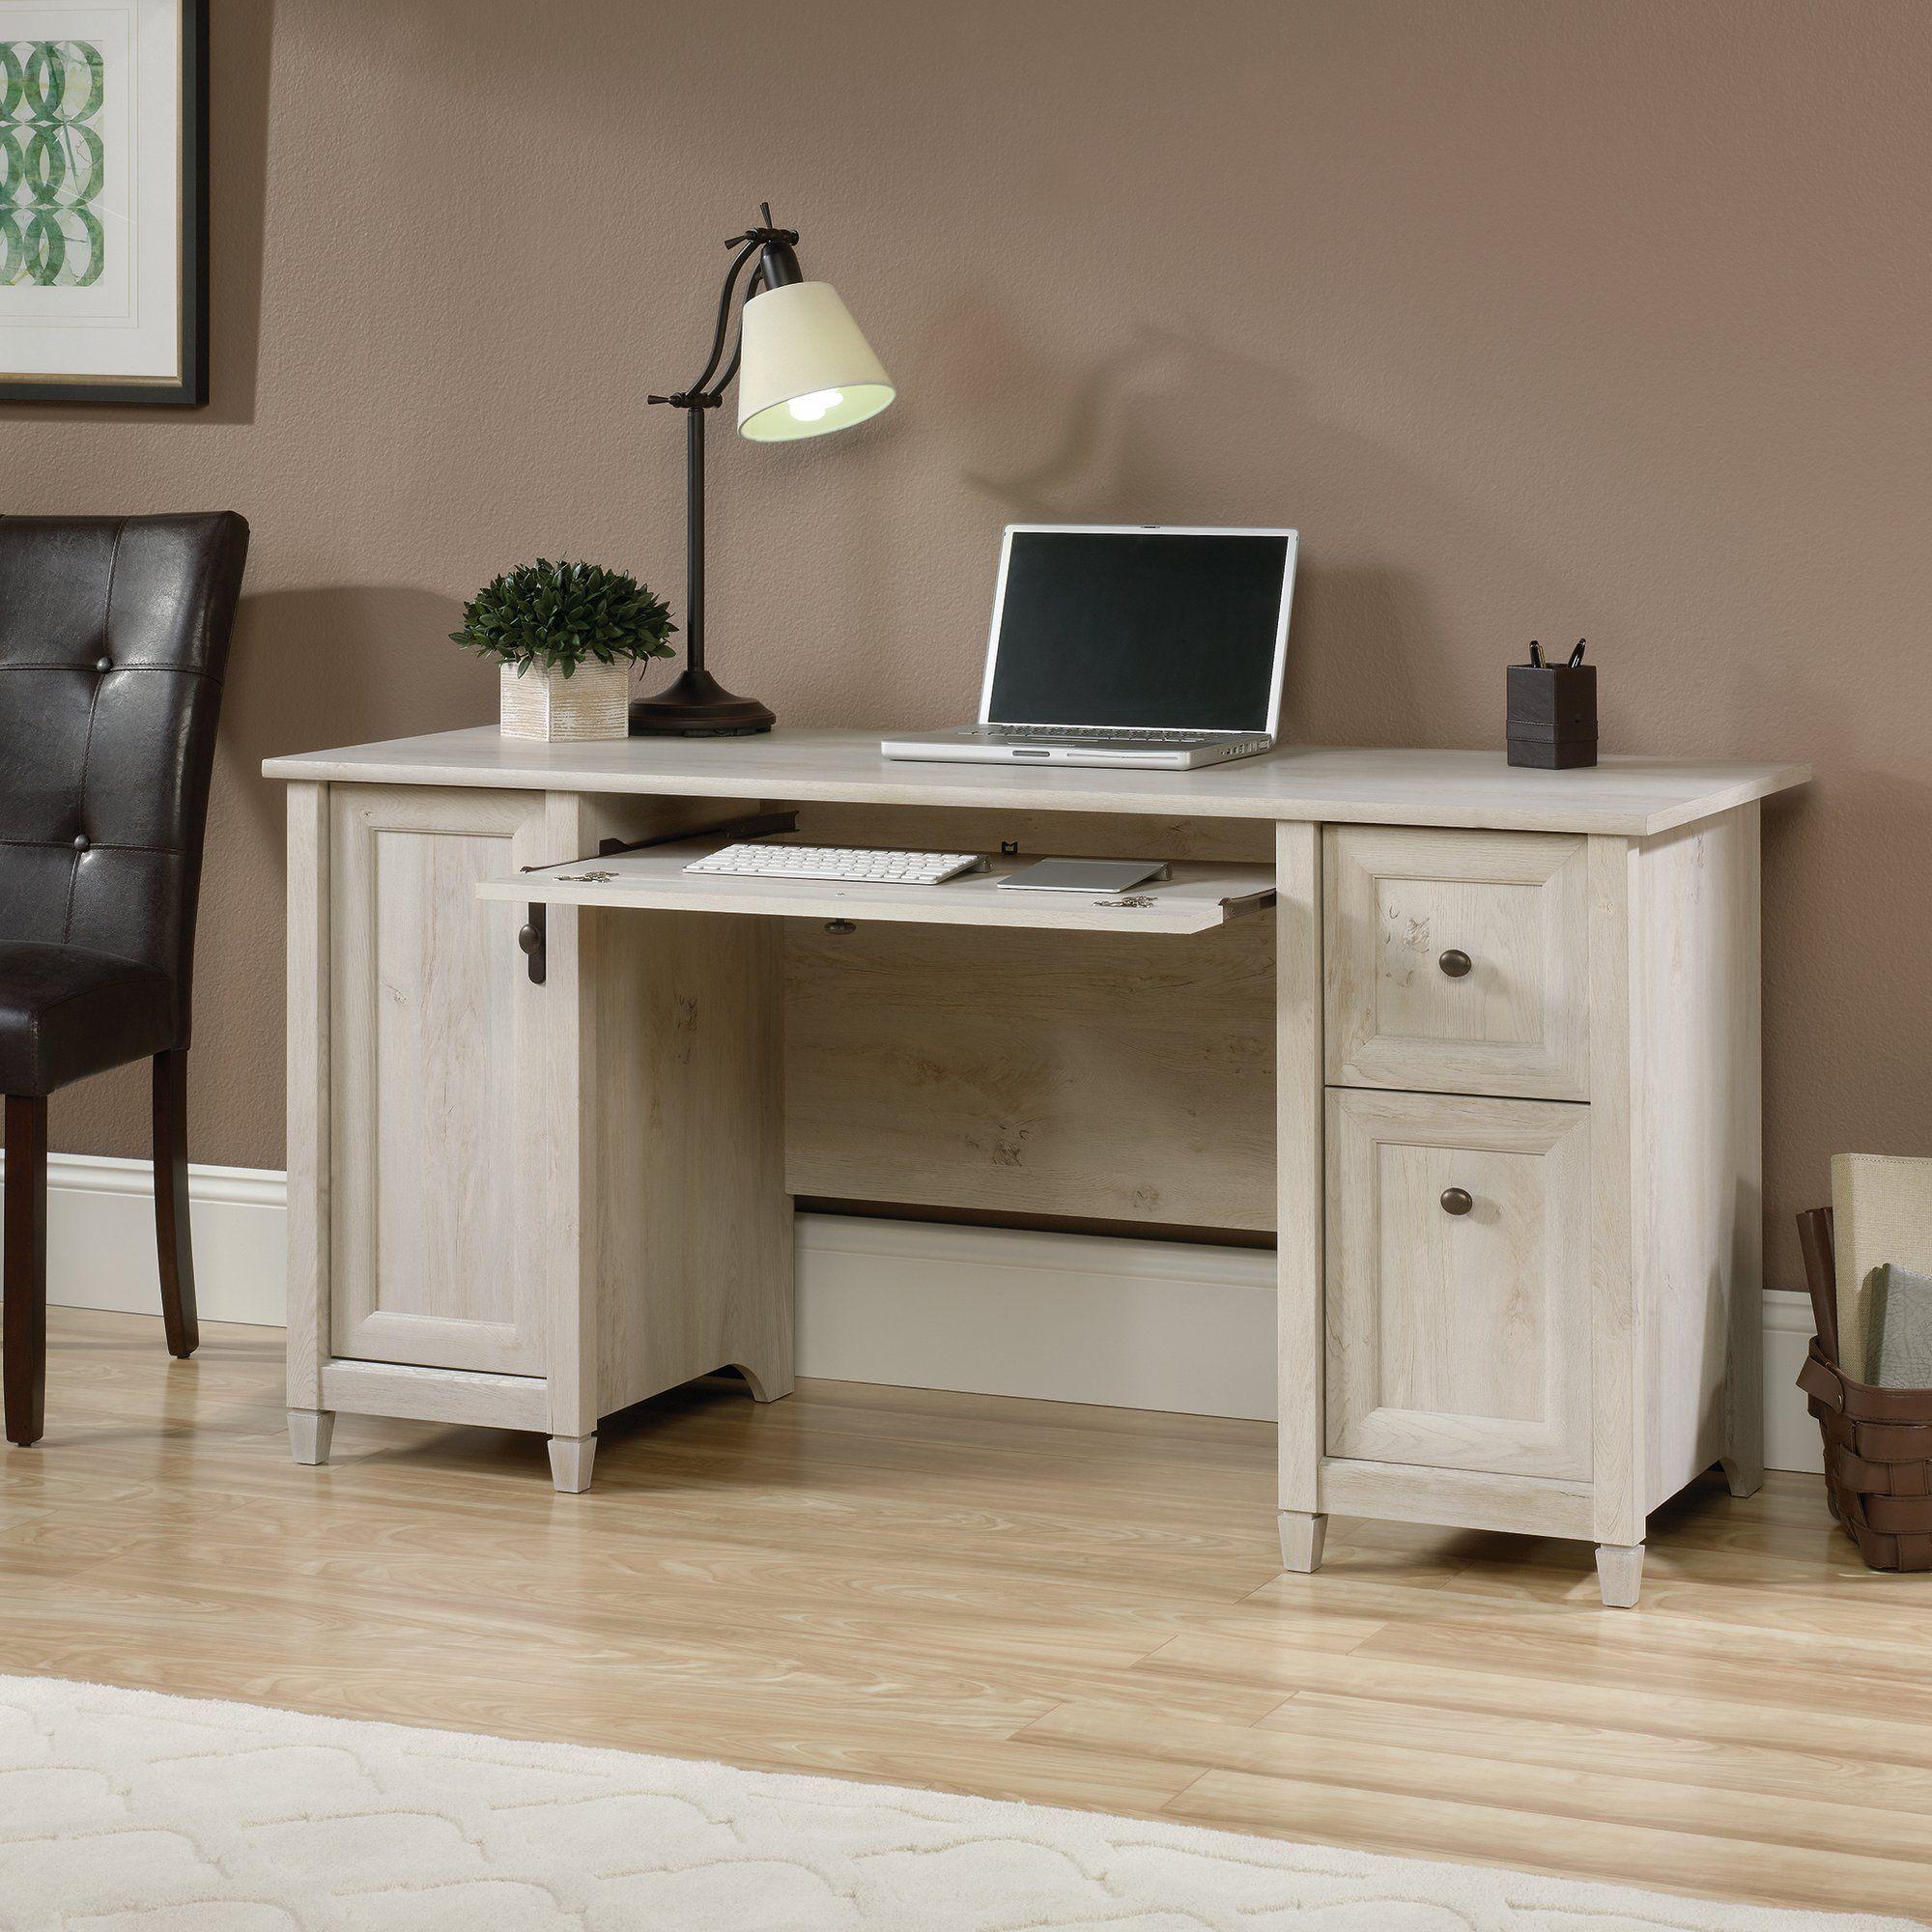 Lamantia Saine Computer Desk (With images) Wood computer